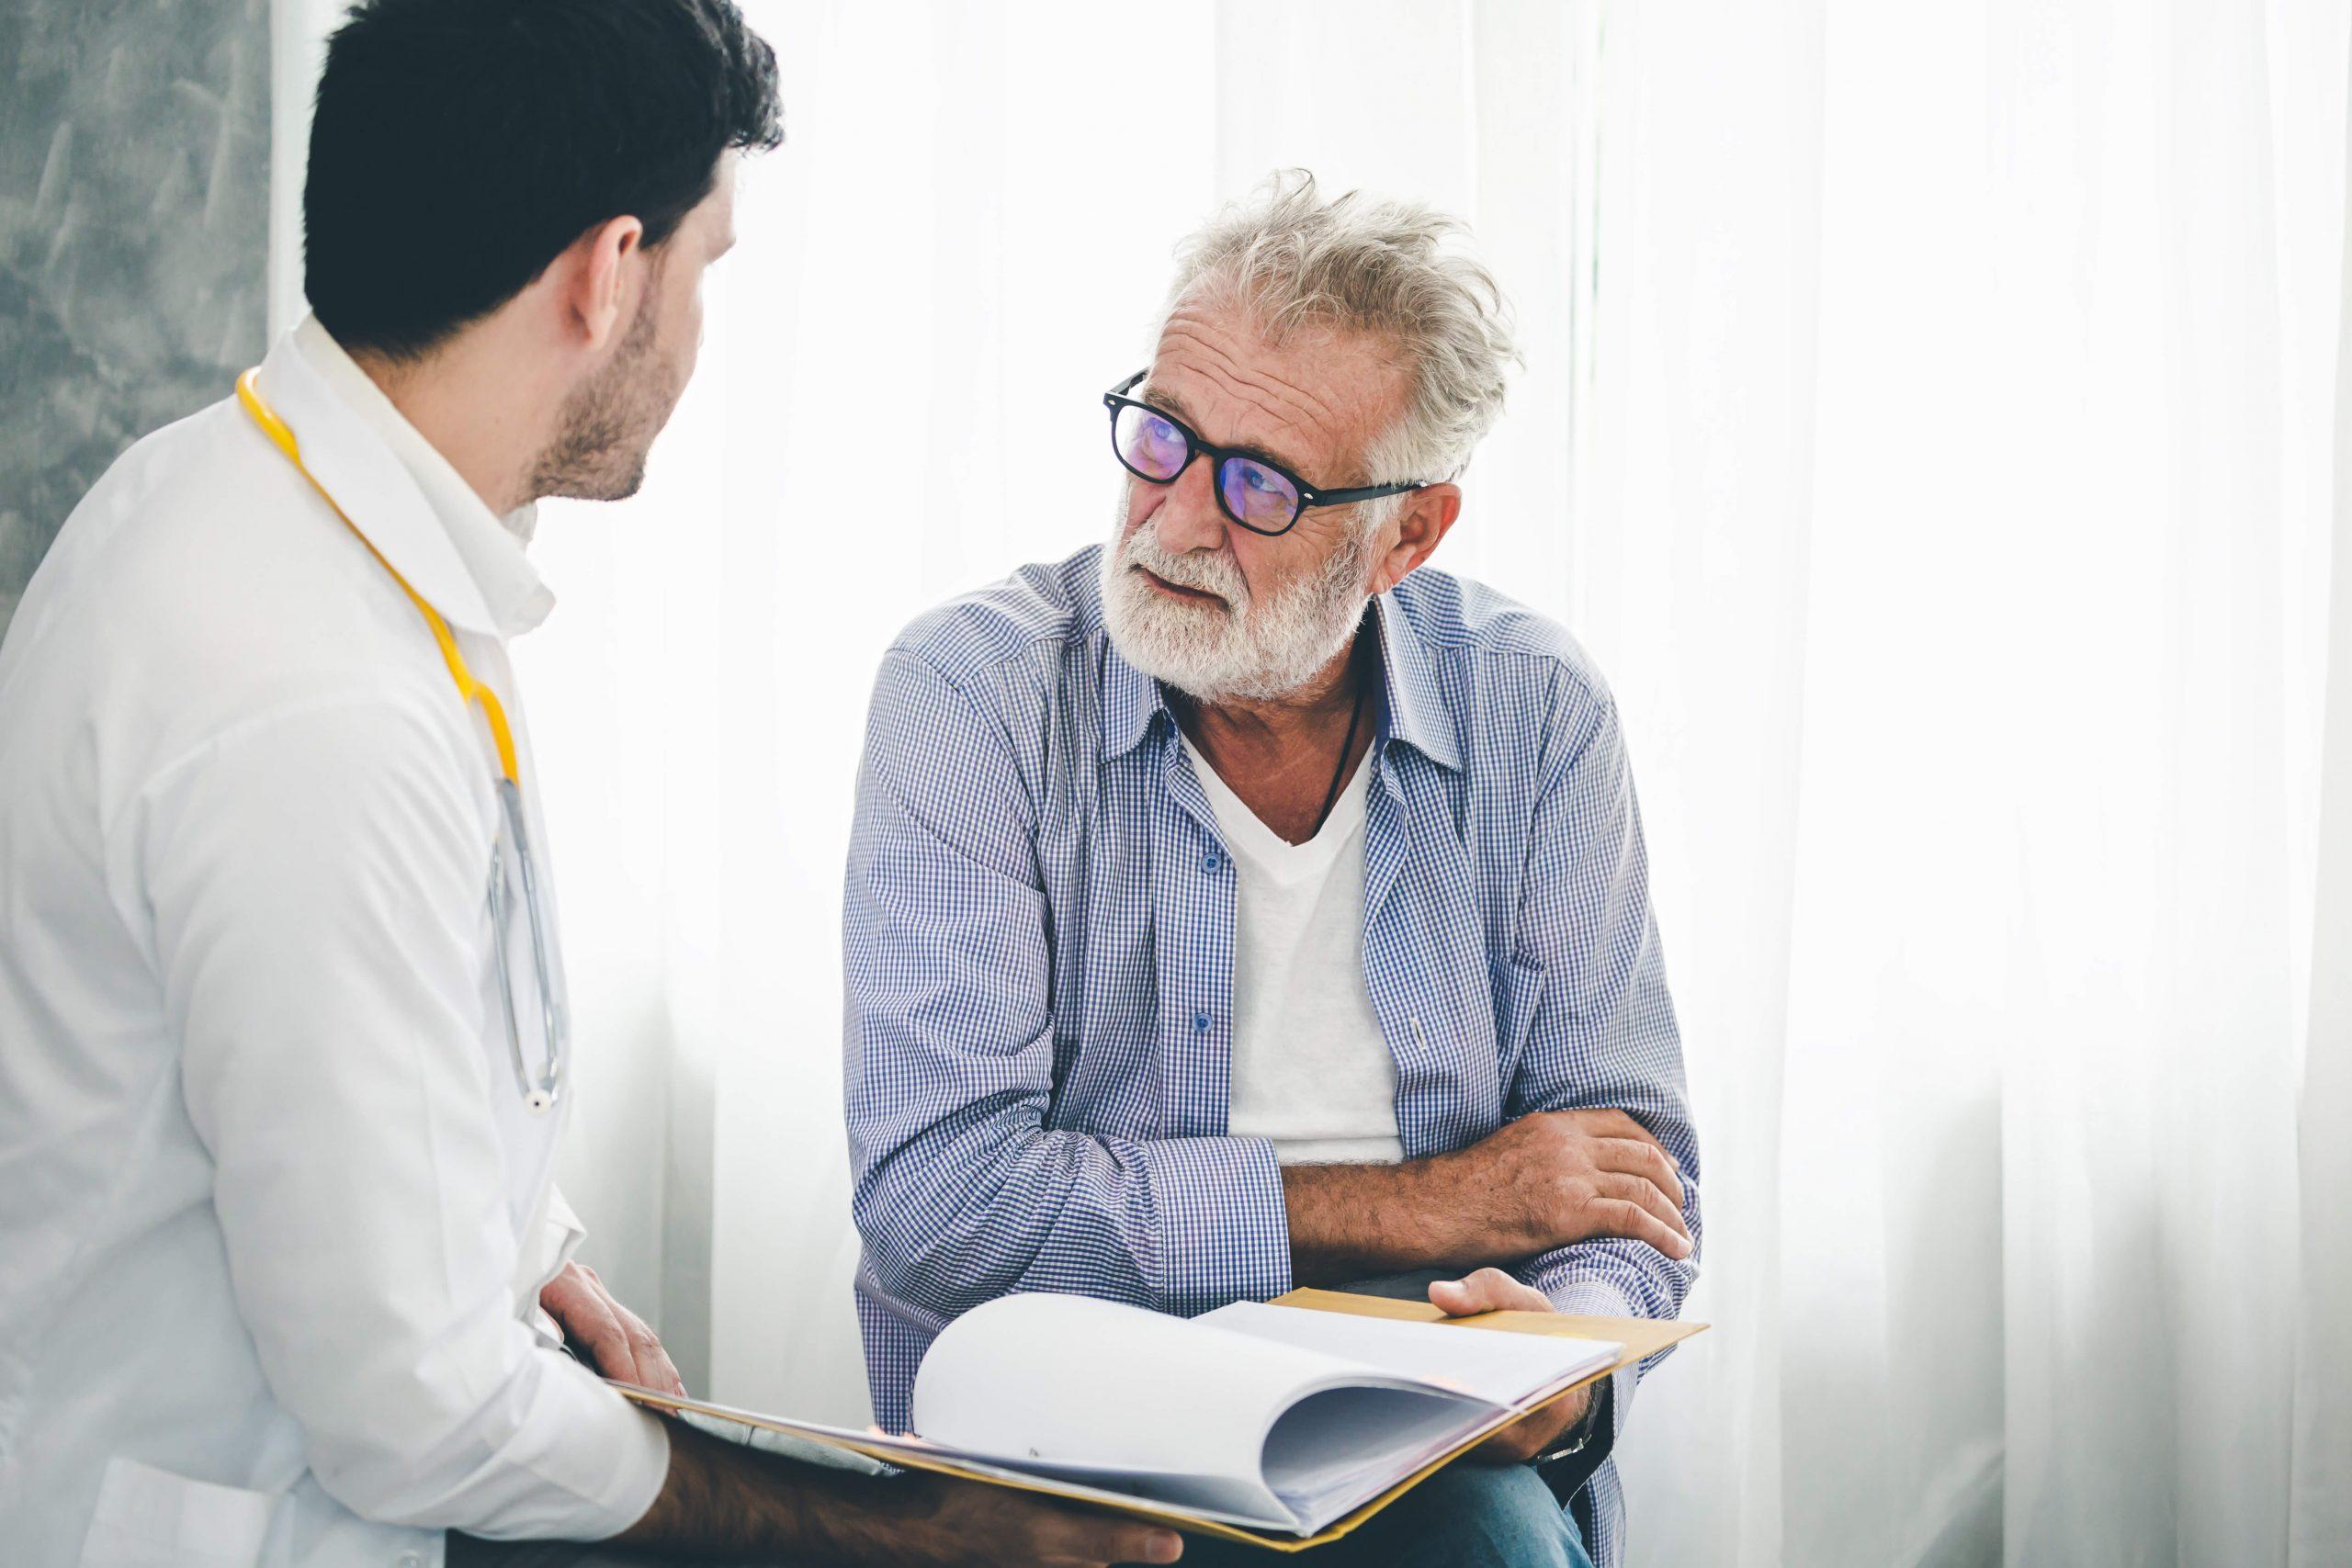 Doctor Patient Failure to Diagnose